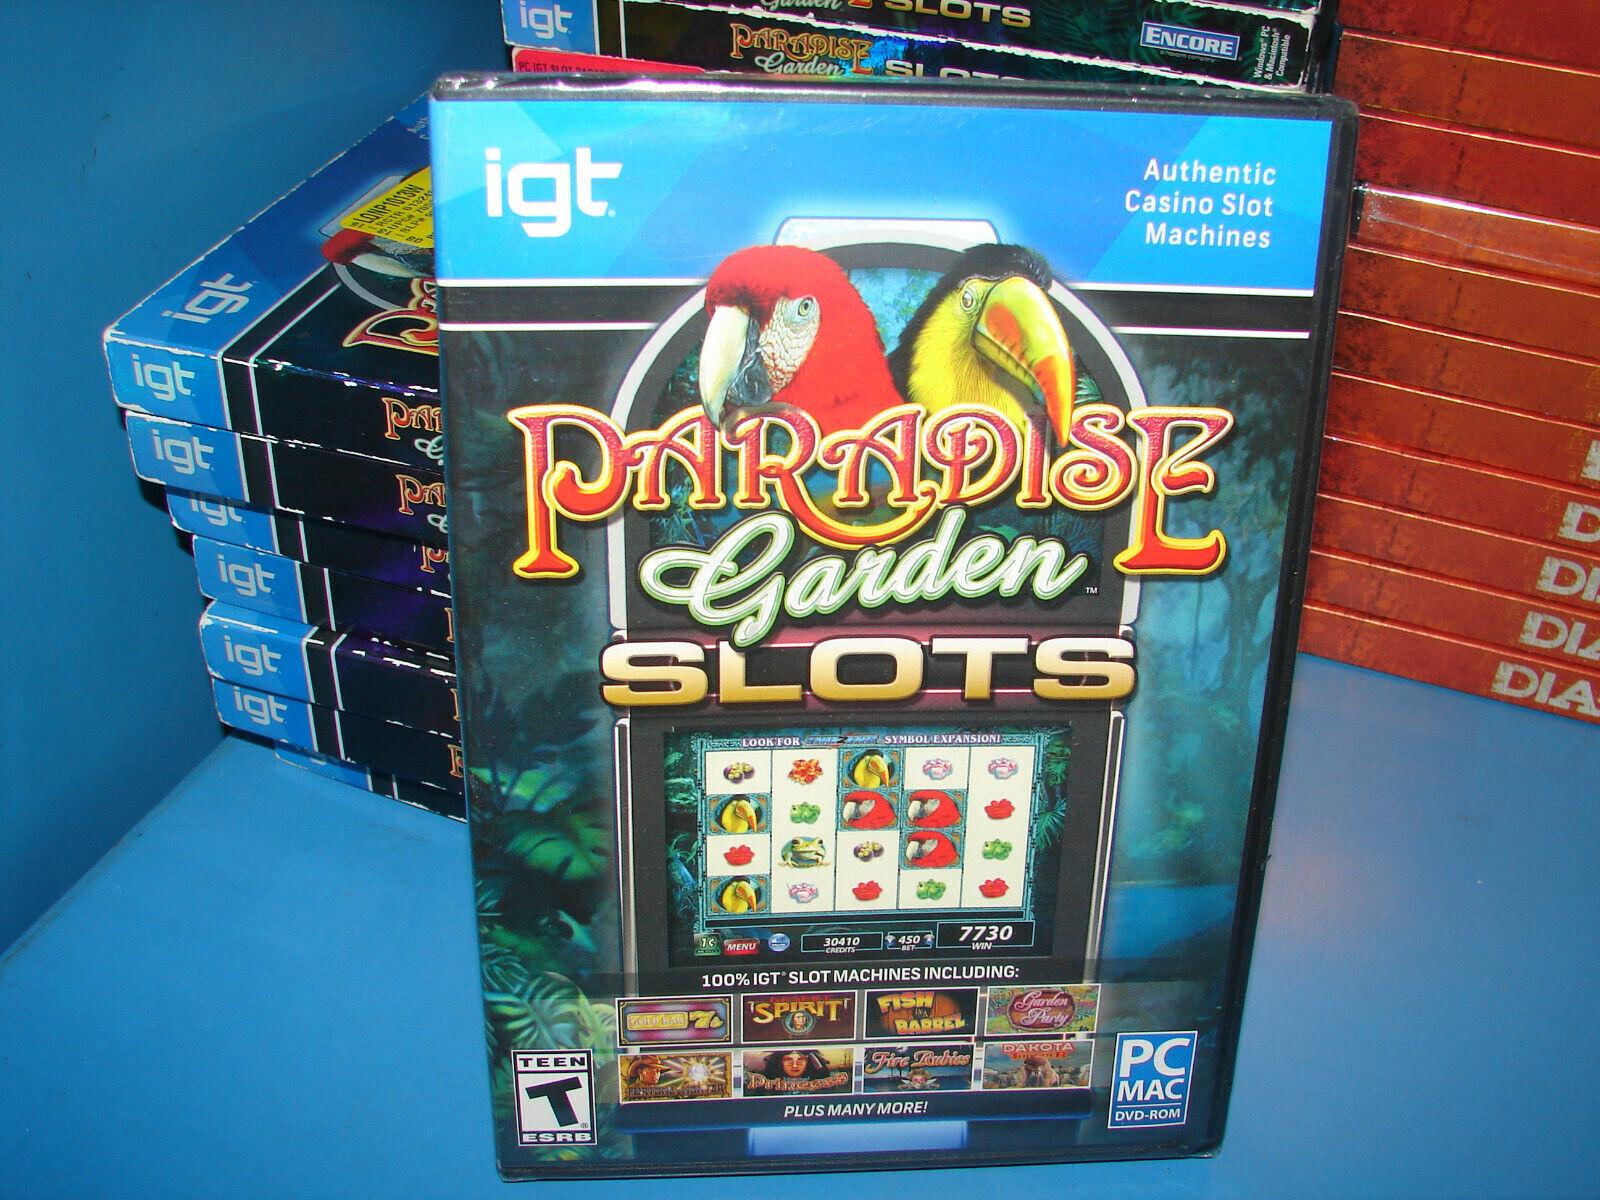 Computer Games - IGT Paradise Garden Slots PC Games Windows 10 8 7 Vista XP Computer slot machine